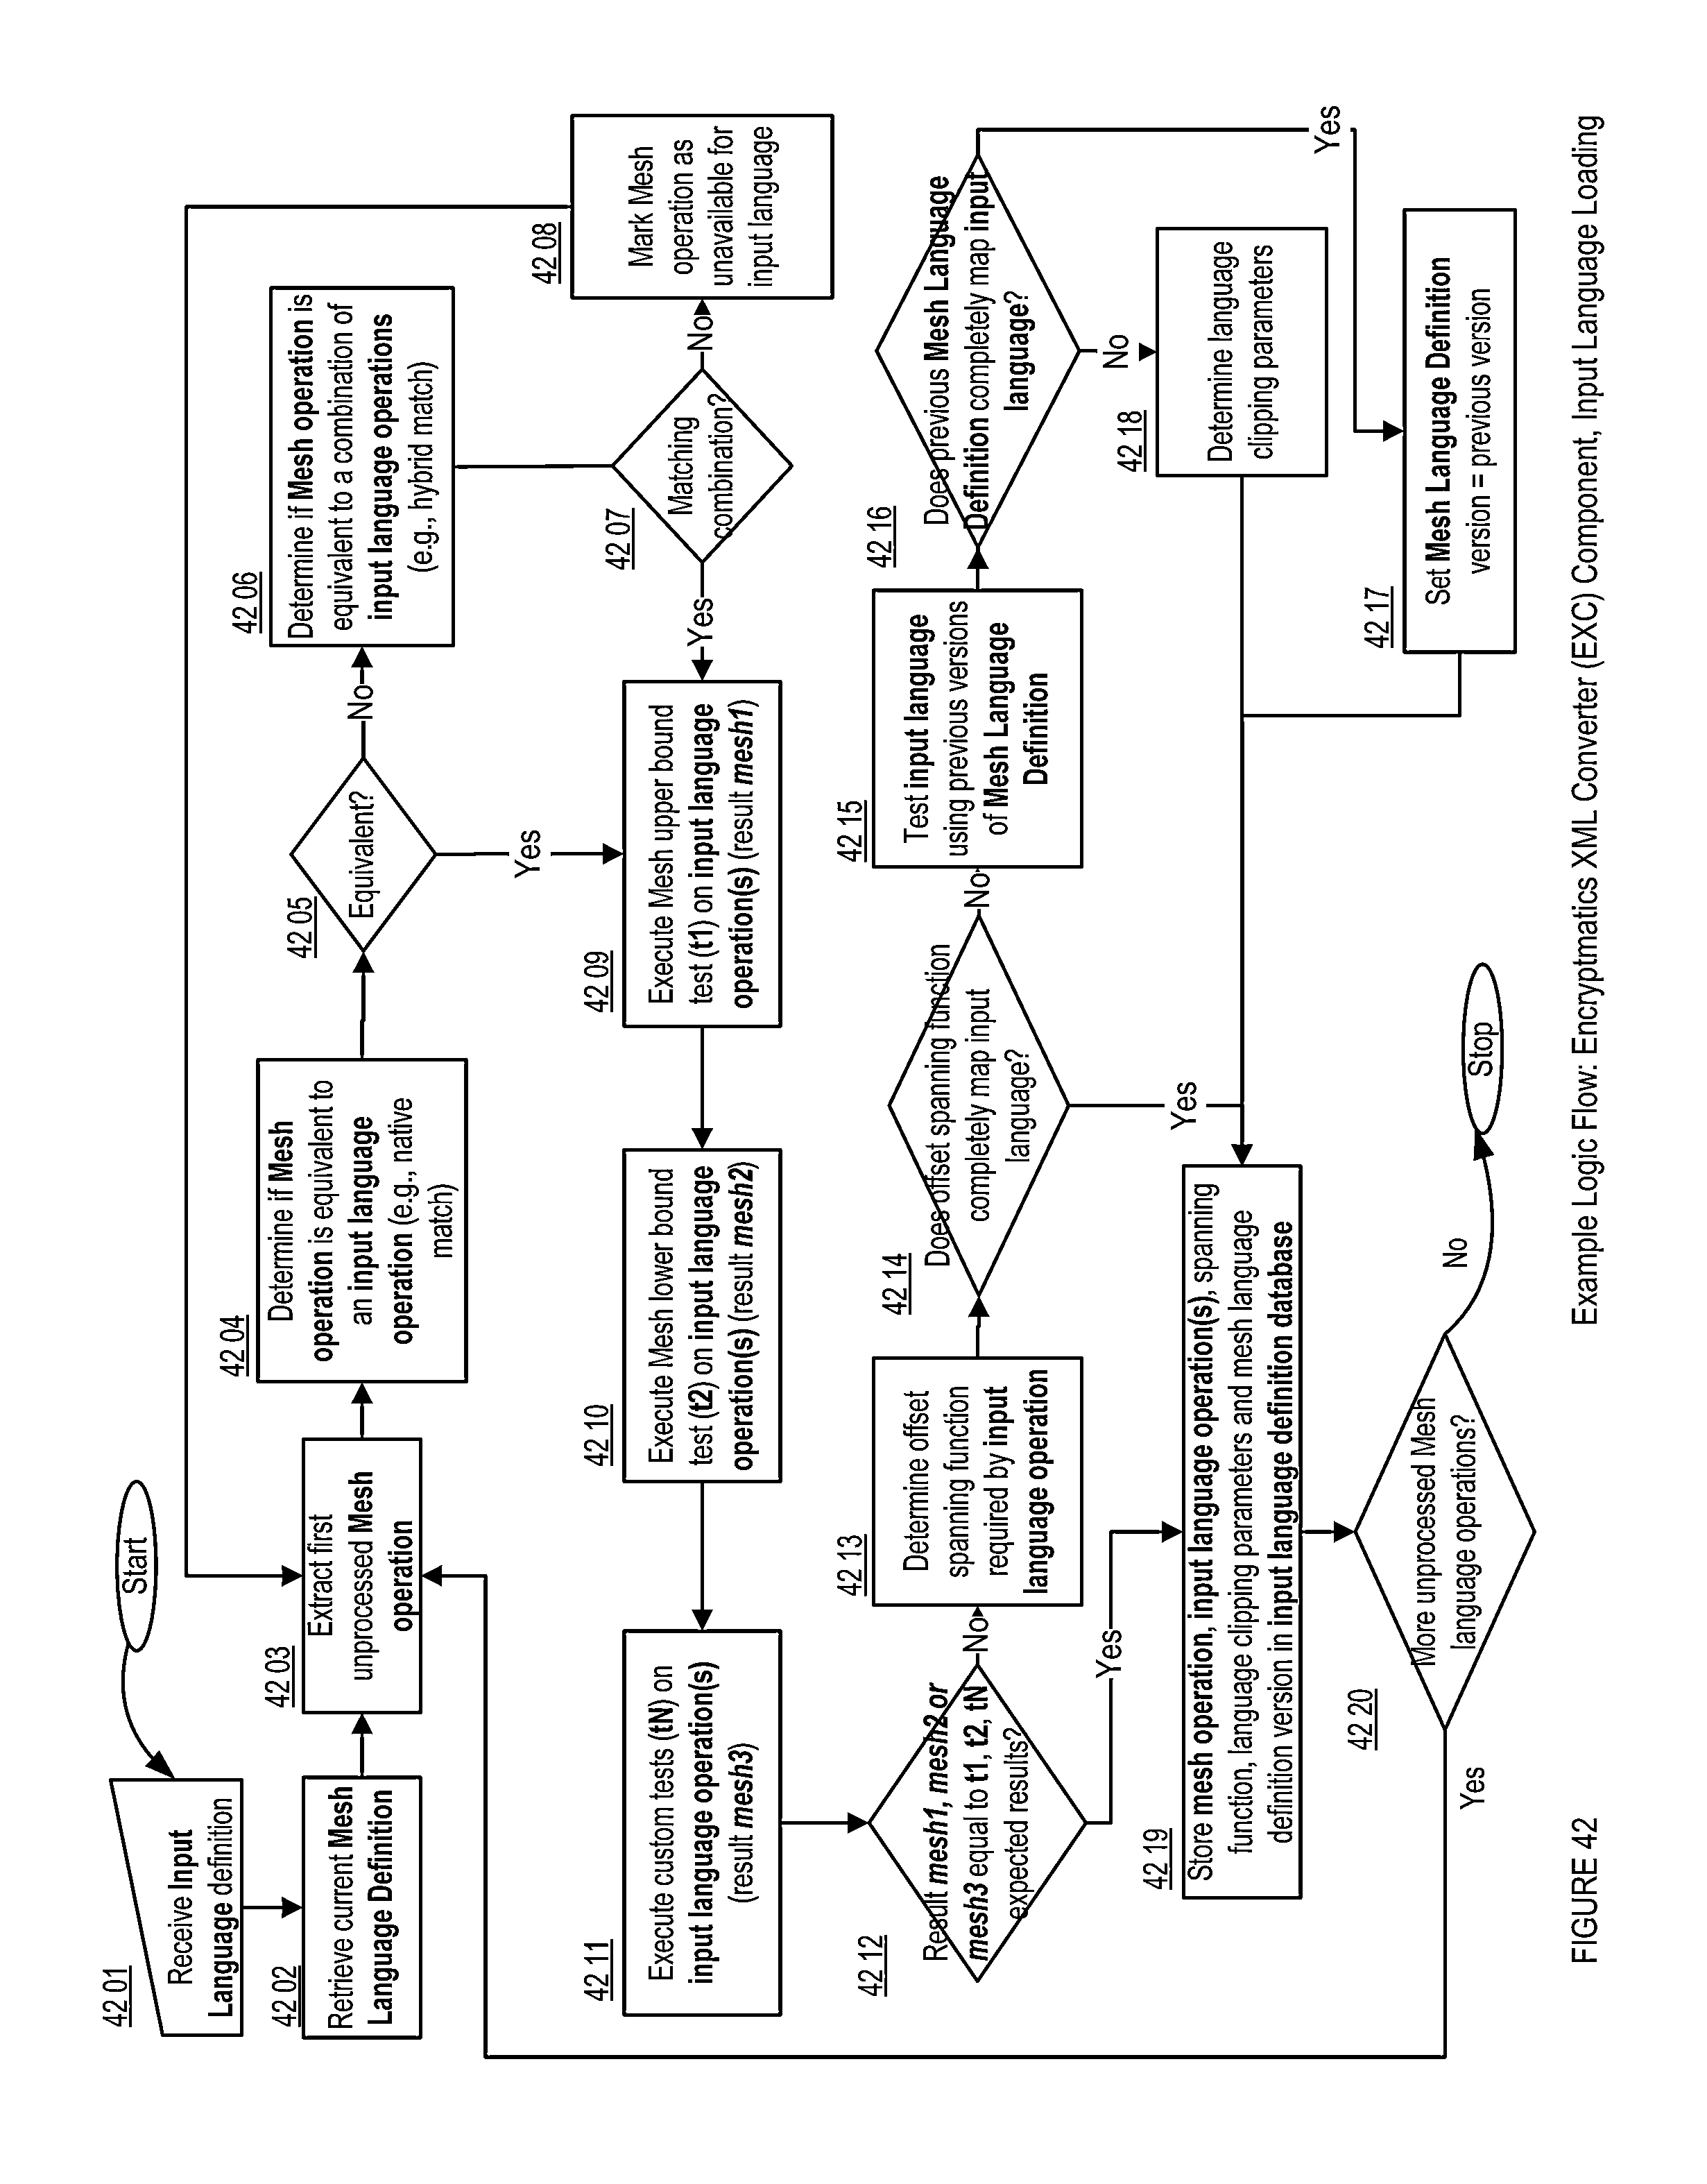 Patent US 9,830,328 B2